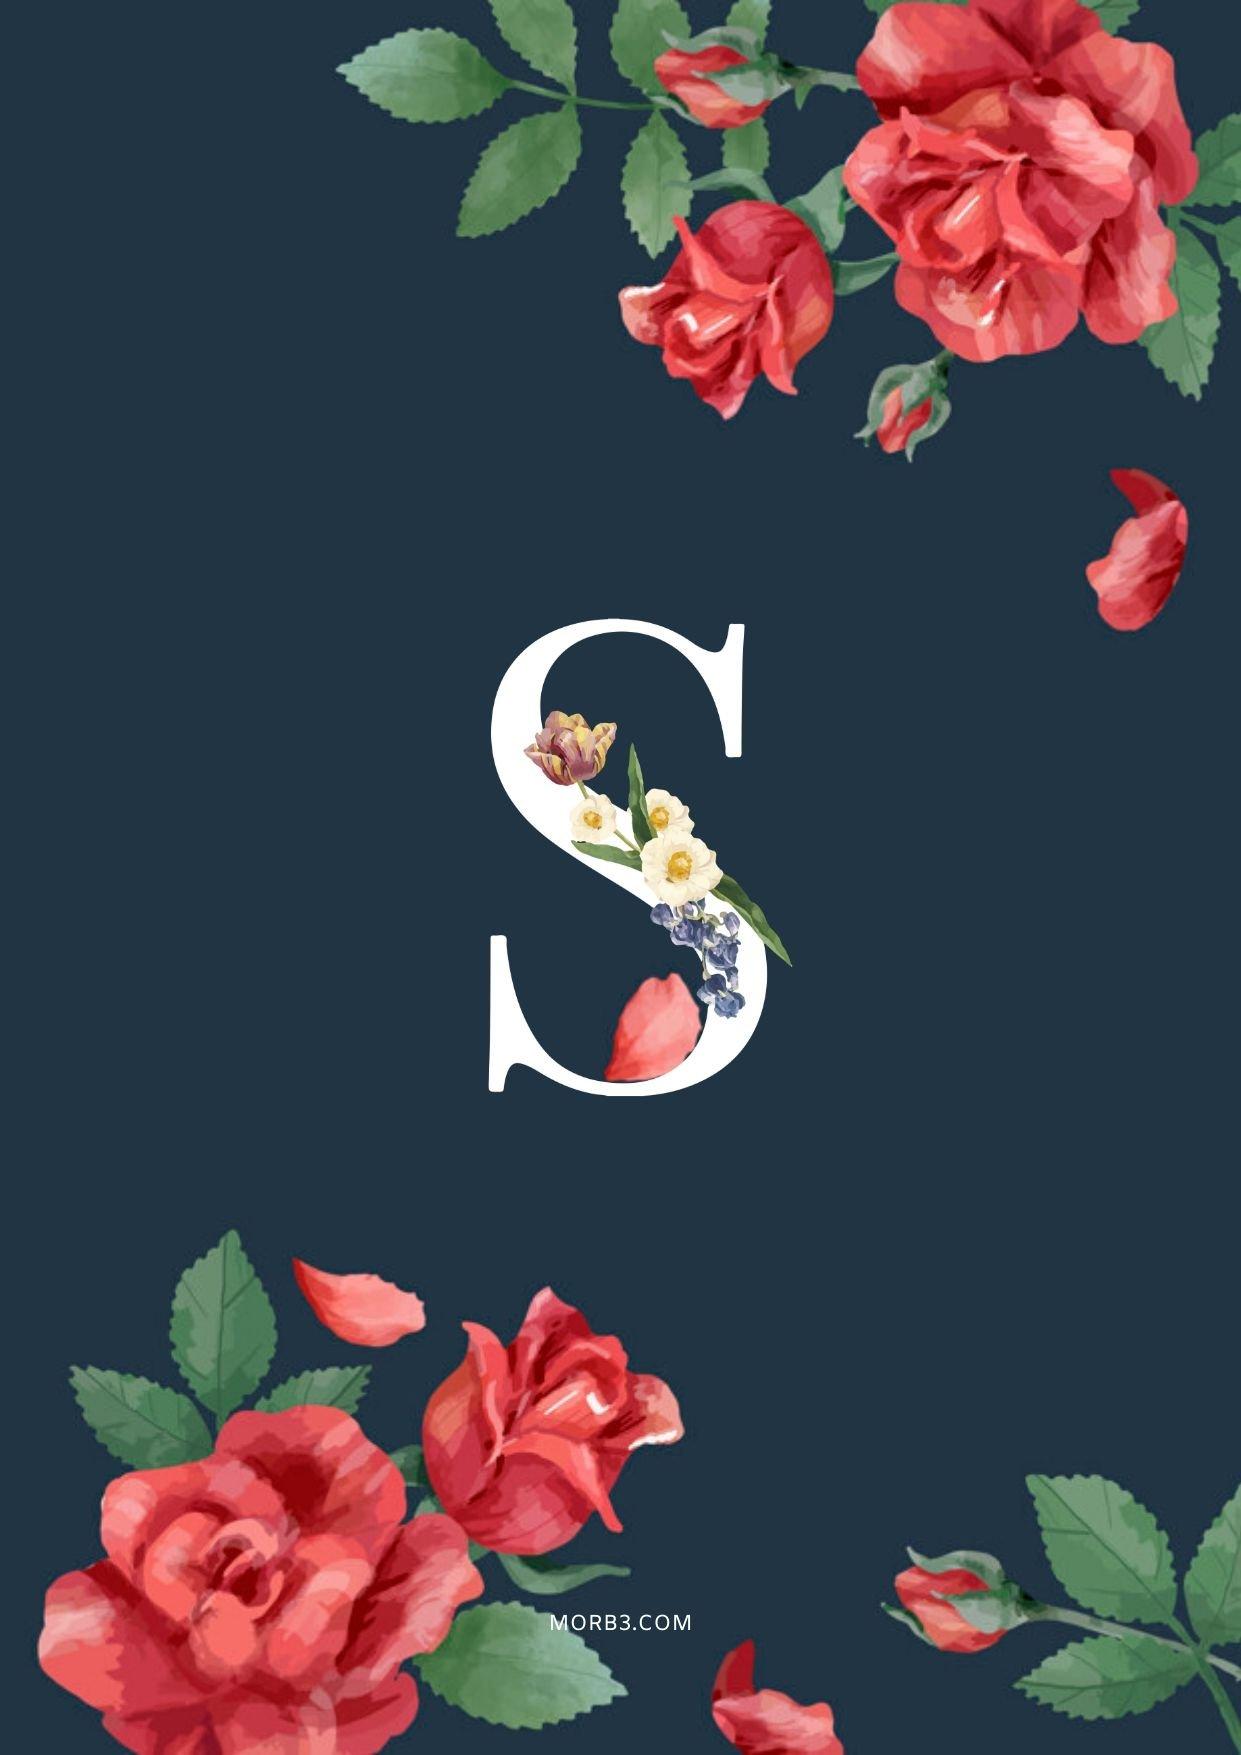 صور حرف S خلفيات حرف S خلفيات حرف S رومانسية اجمل حرف S في العالم حرف S بالورد حرف S احبك حرف S في قلوب حرف S مع كلام حب خلفيات حرف